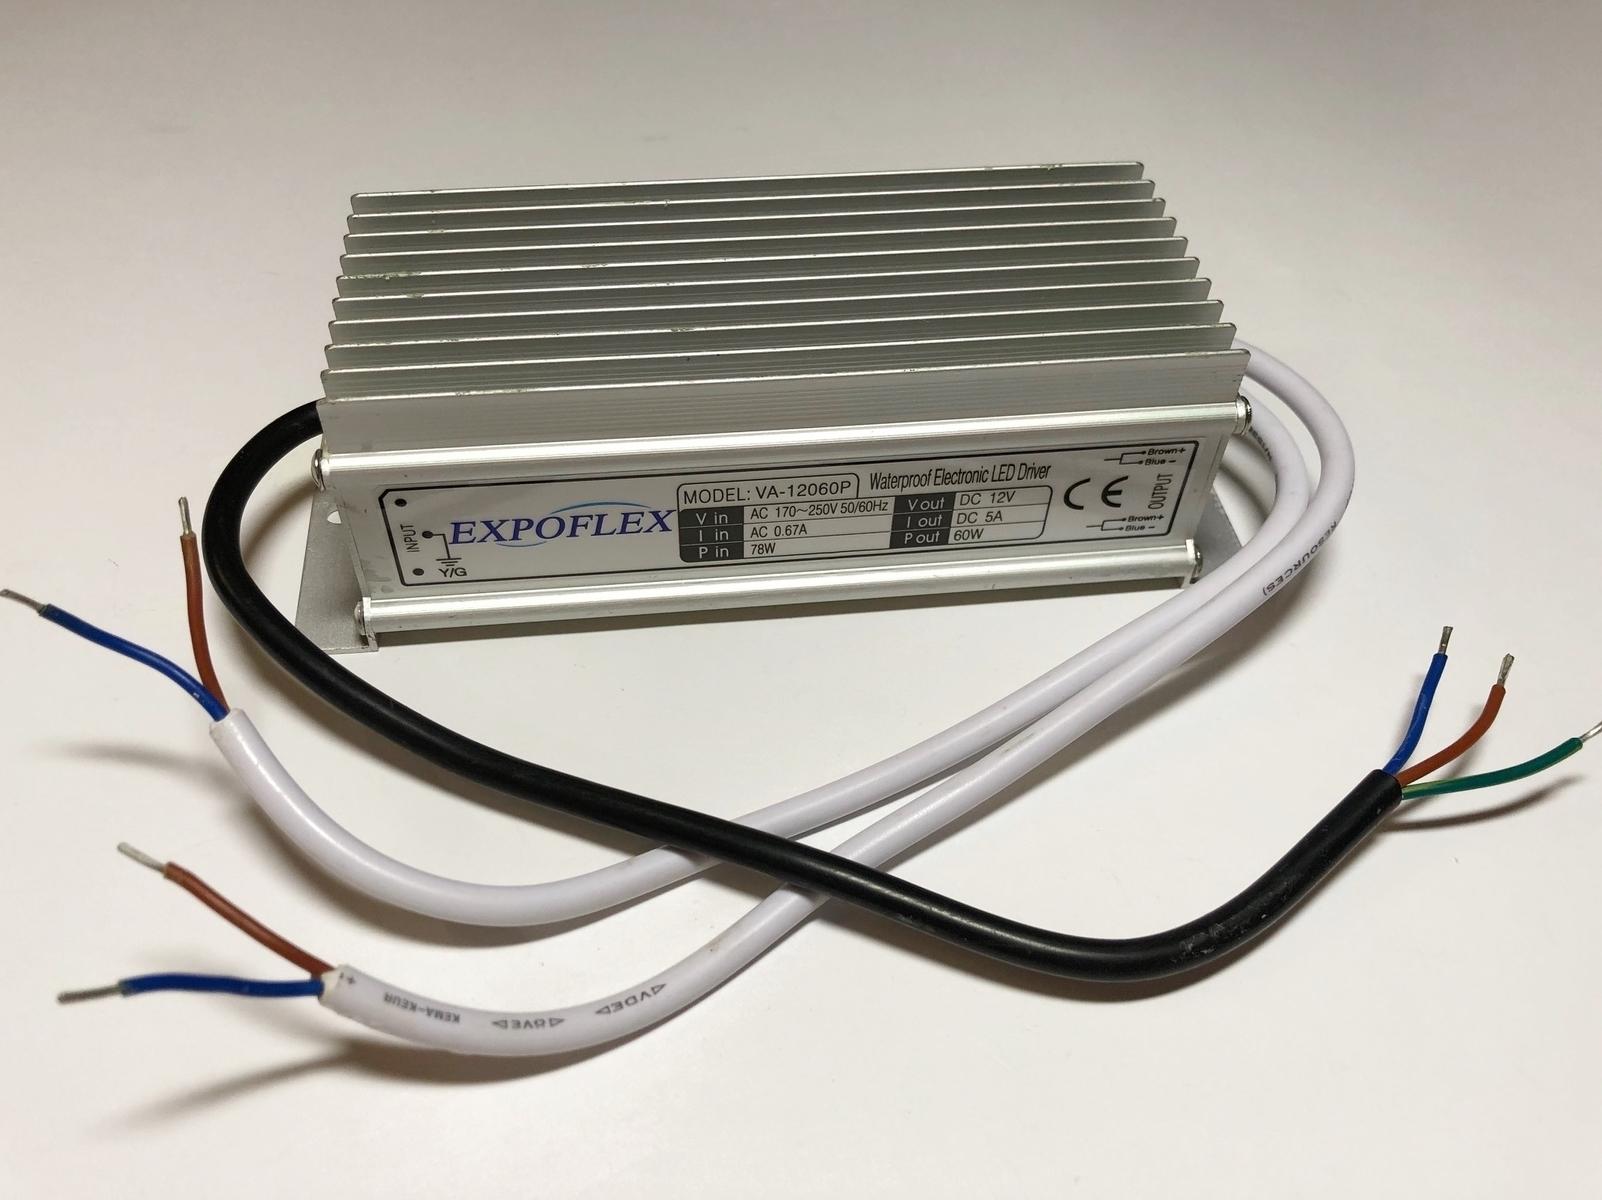 Elektrooniline  LED  trafo 60 W, 12 V, Expoflex, VA-12060P